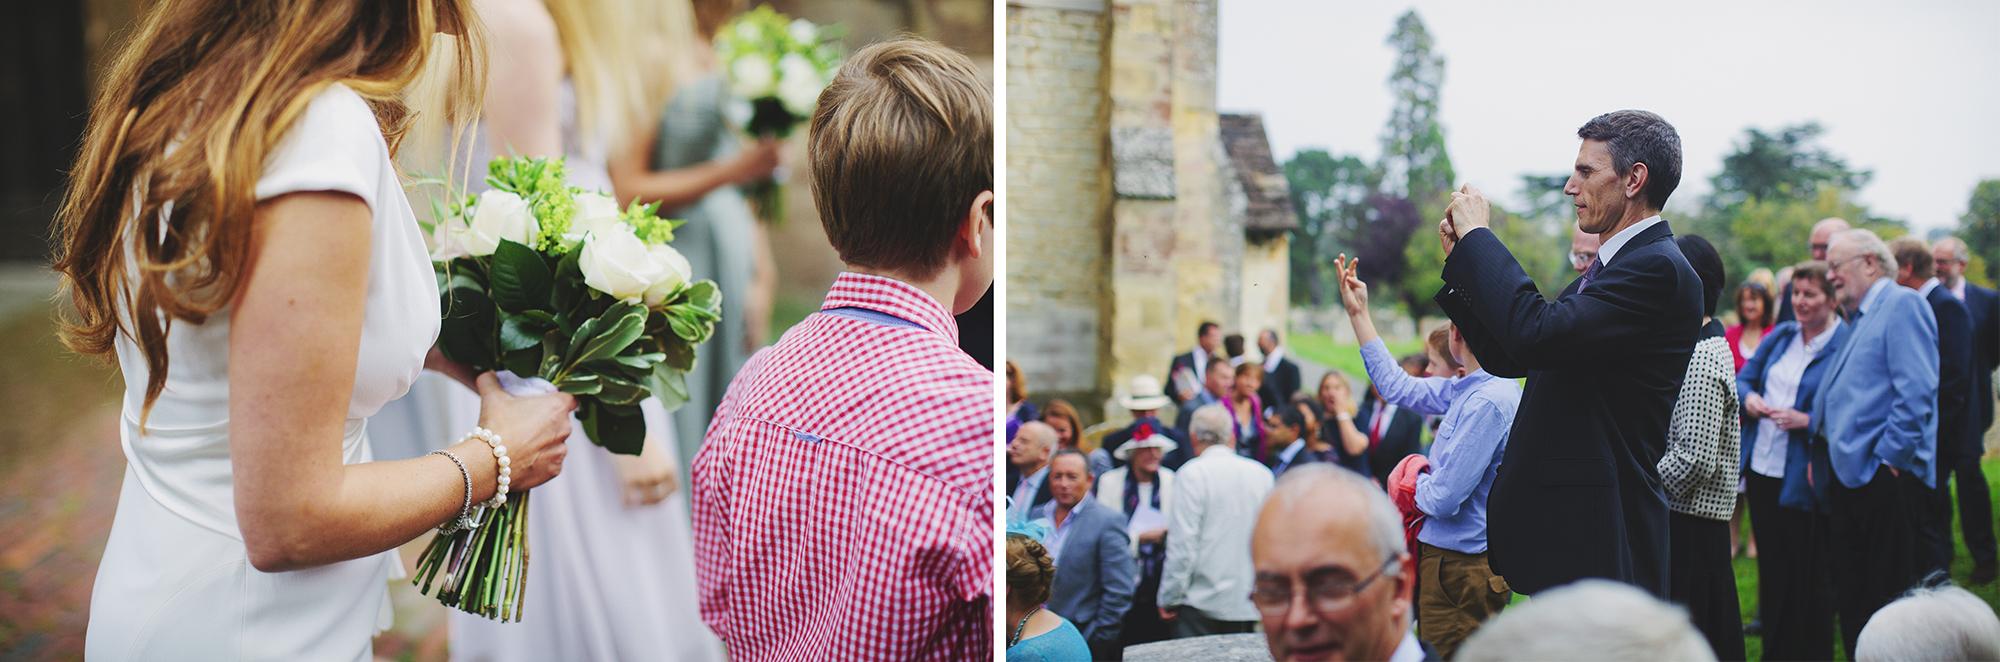 katie leask photography wedding la coco noire 008.